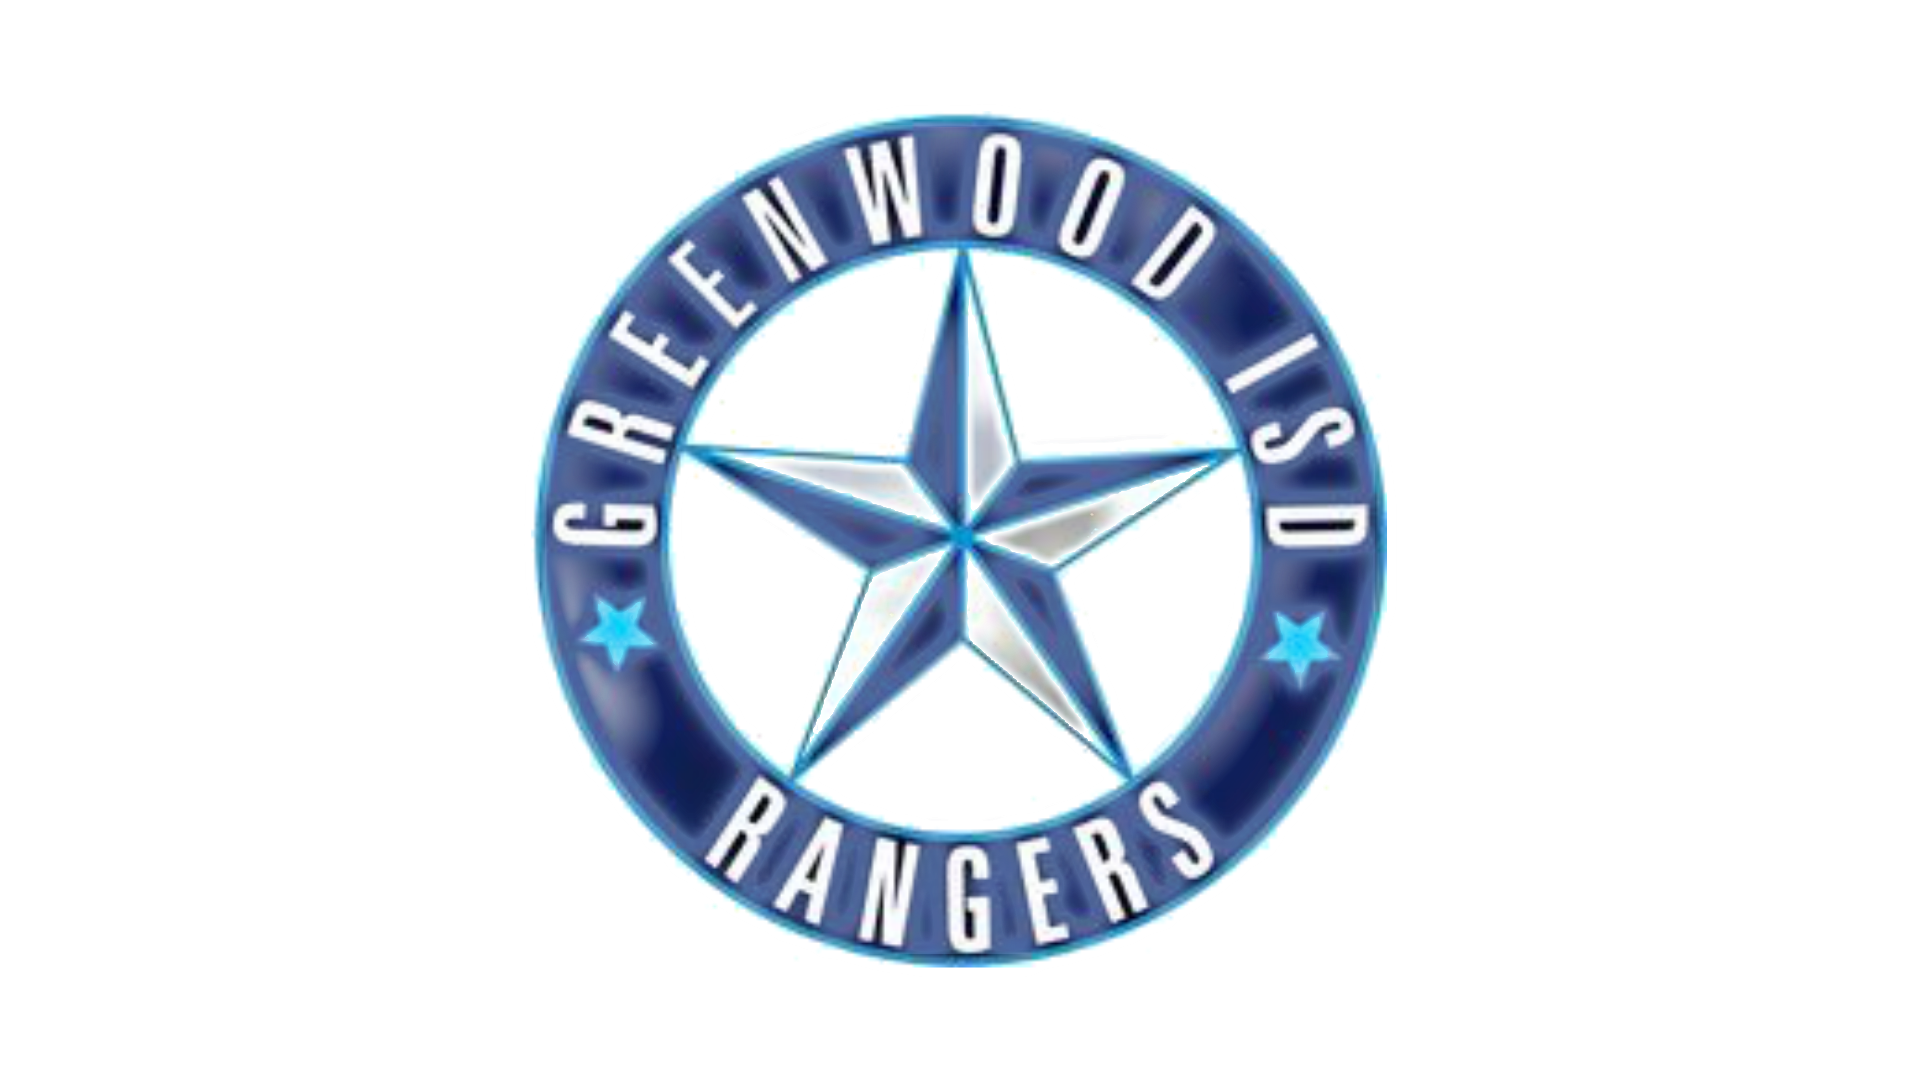 Greenwood ISD Rangers_1542030475999.png.jpg